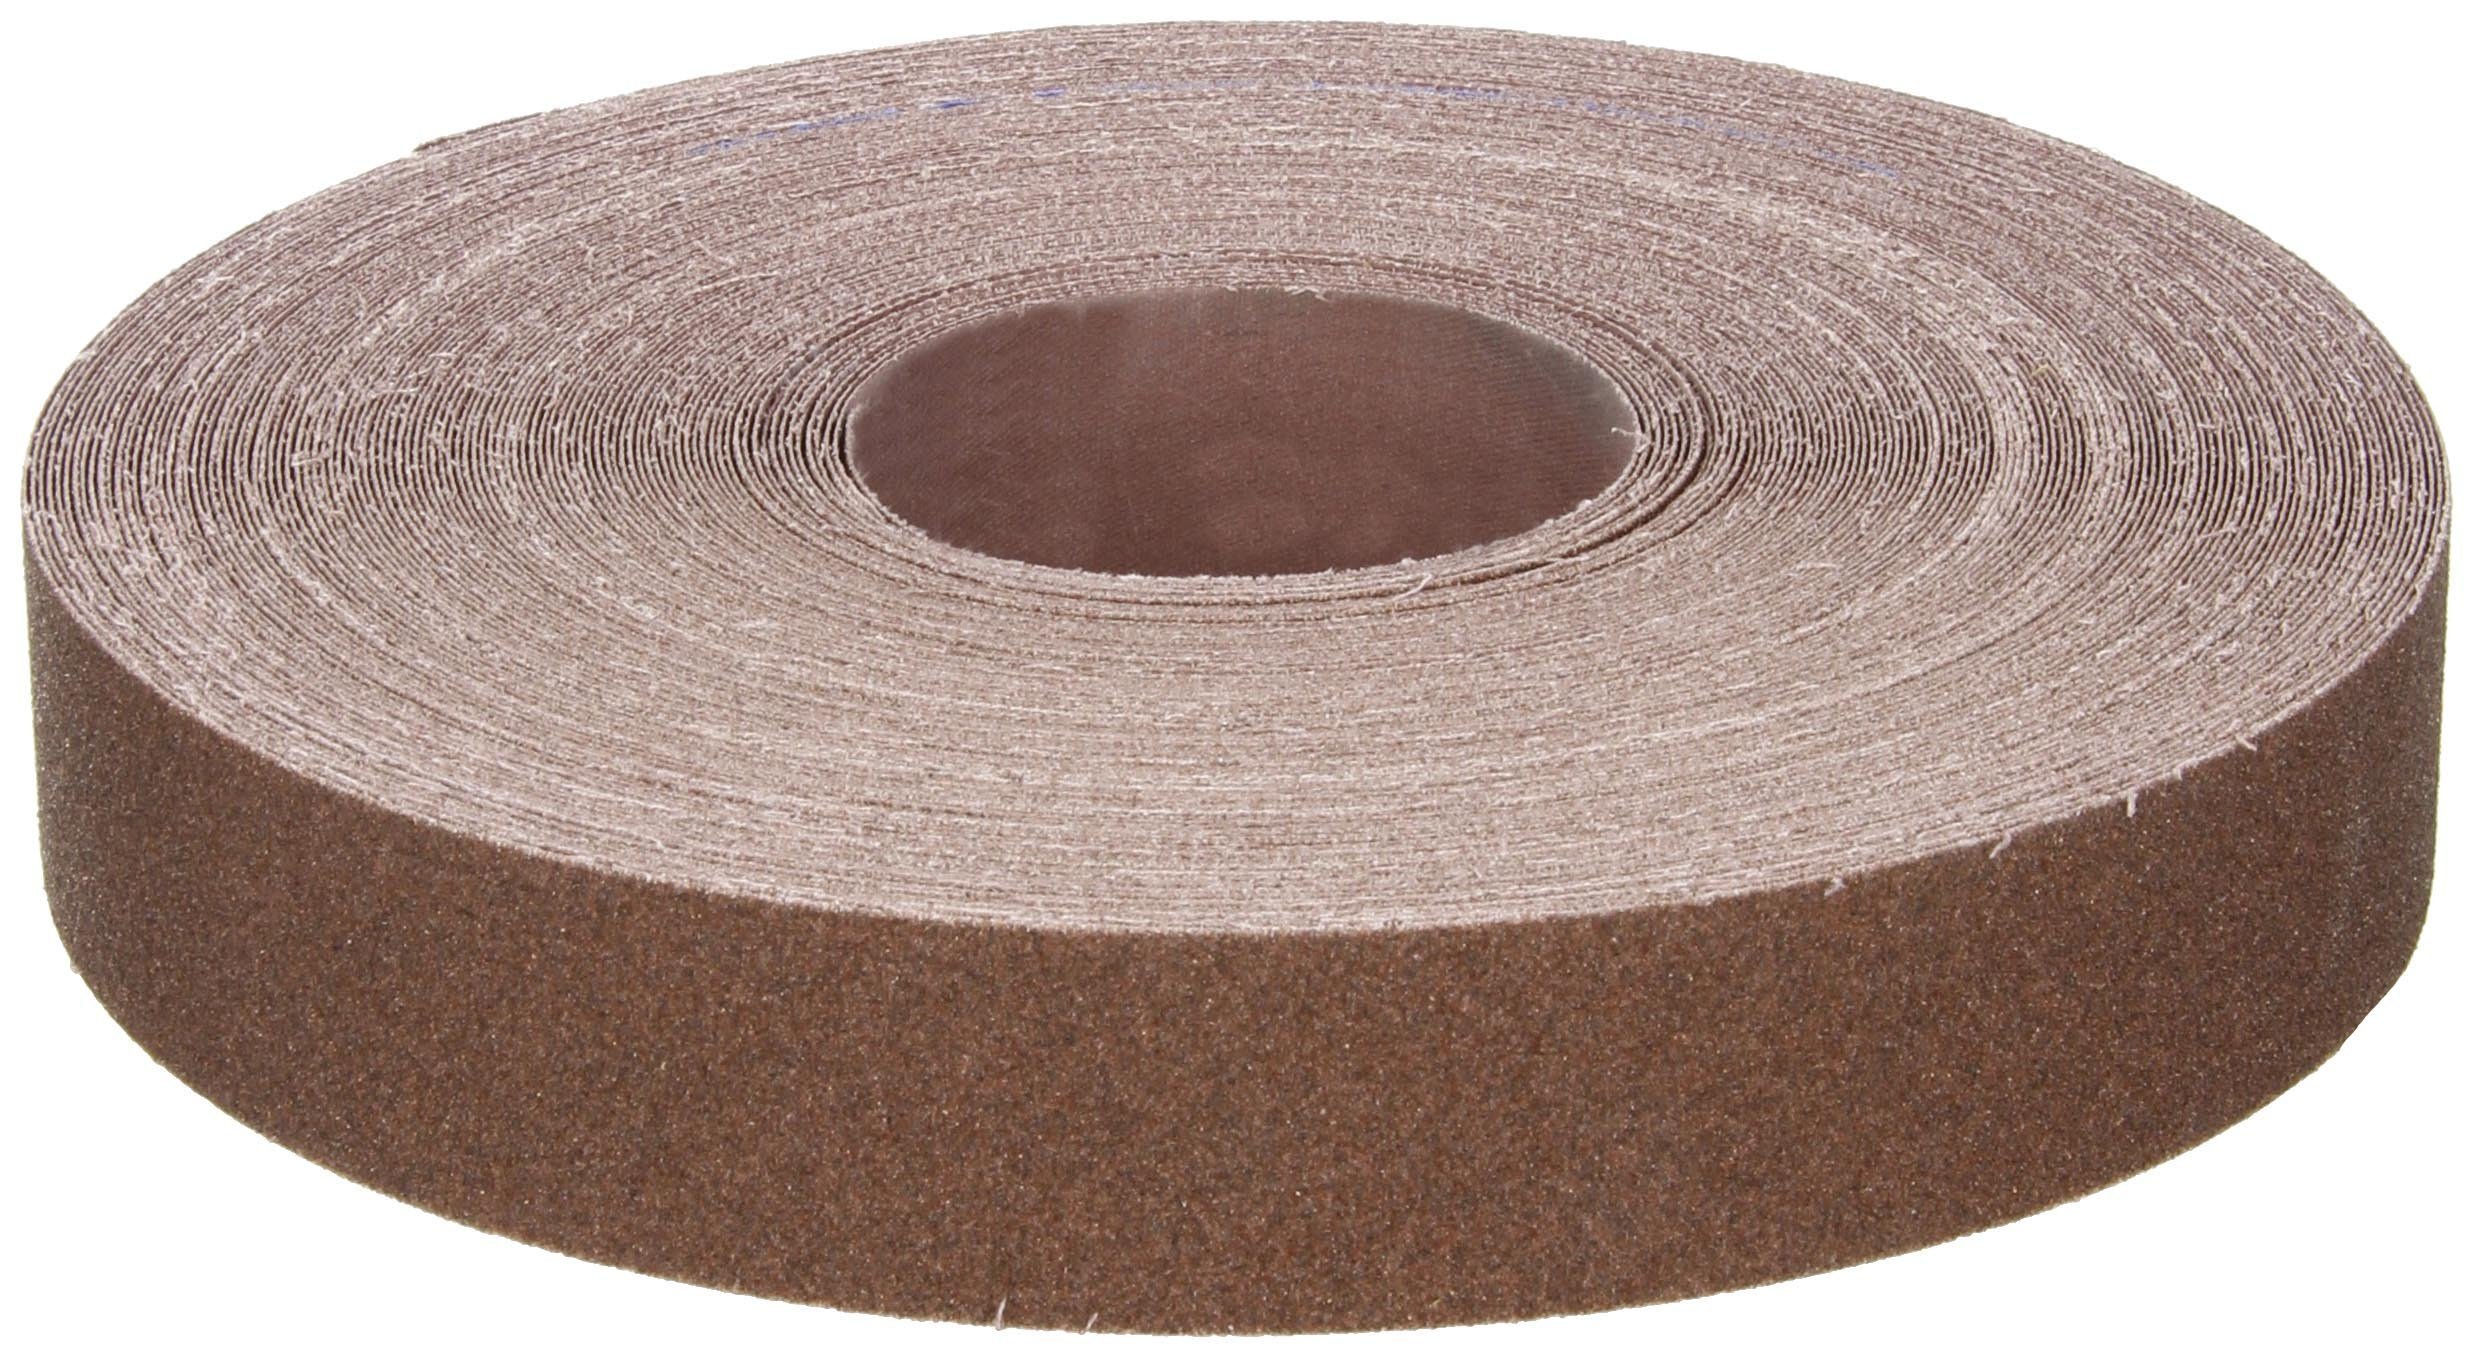 Norton K225 Metalite Abrasive Roll, Cloth Backing, Aluminum Oxide, 1-1/2'' Width x 50yd Length, Grit P80